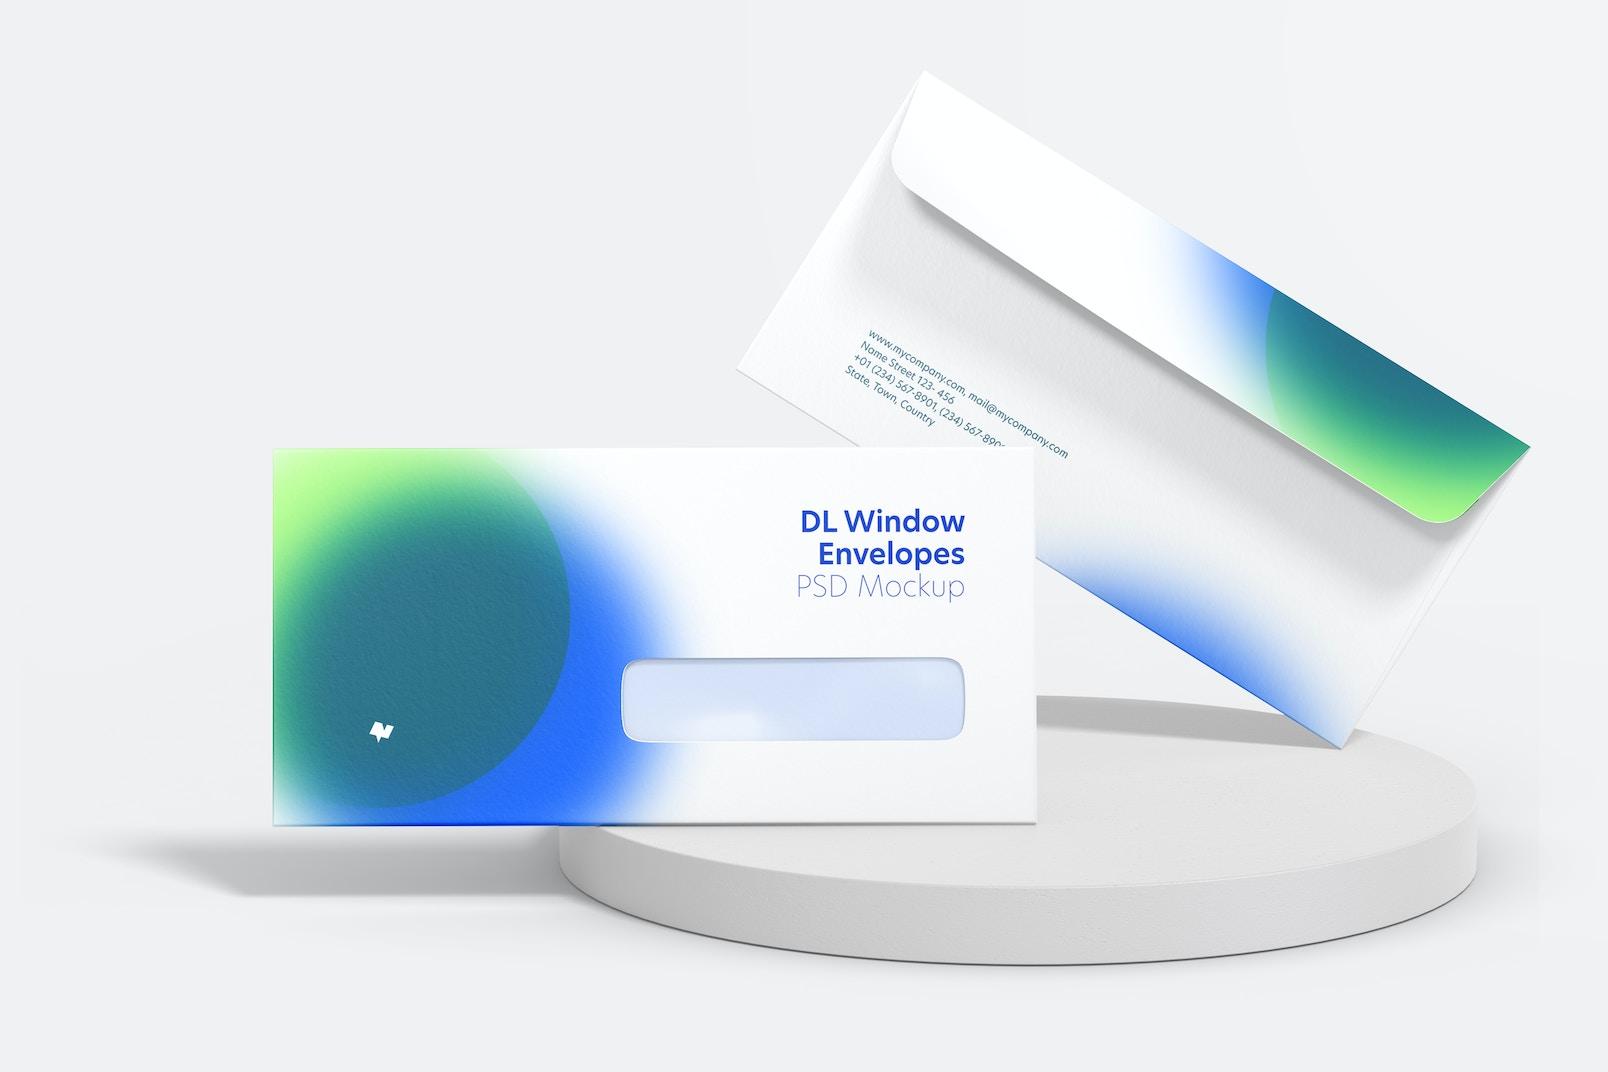 DL Window Envelopes Mockup, Front View